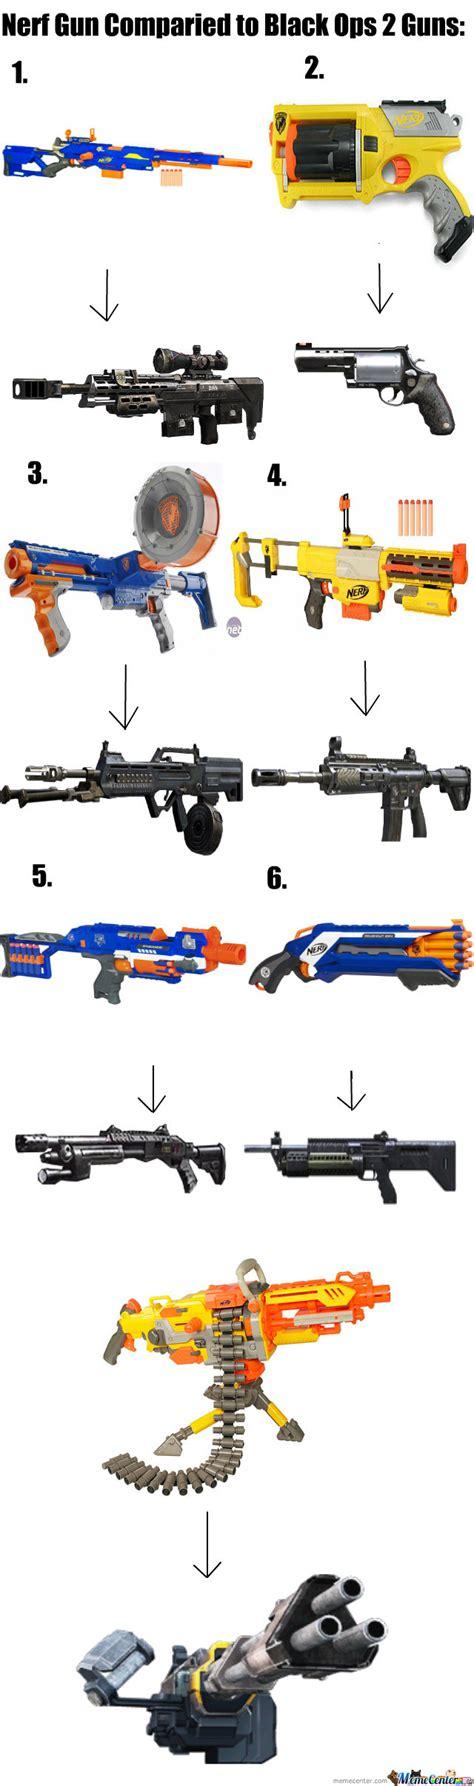 Nerf Gun Meme - nerf guns compaired to bo2 guns by thatguycalledalex